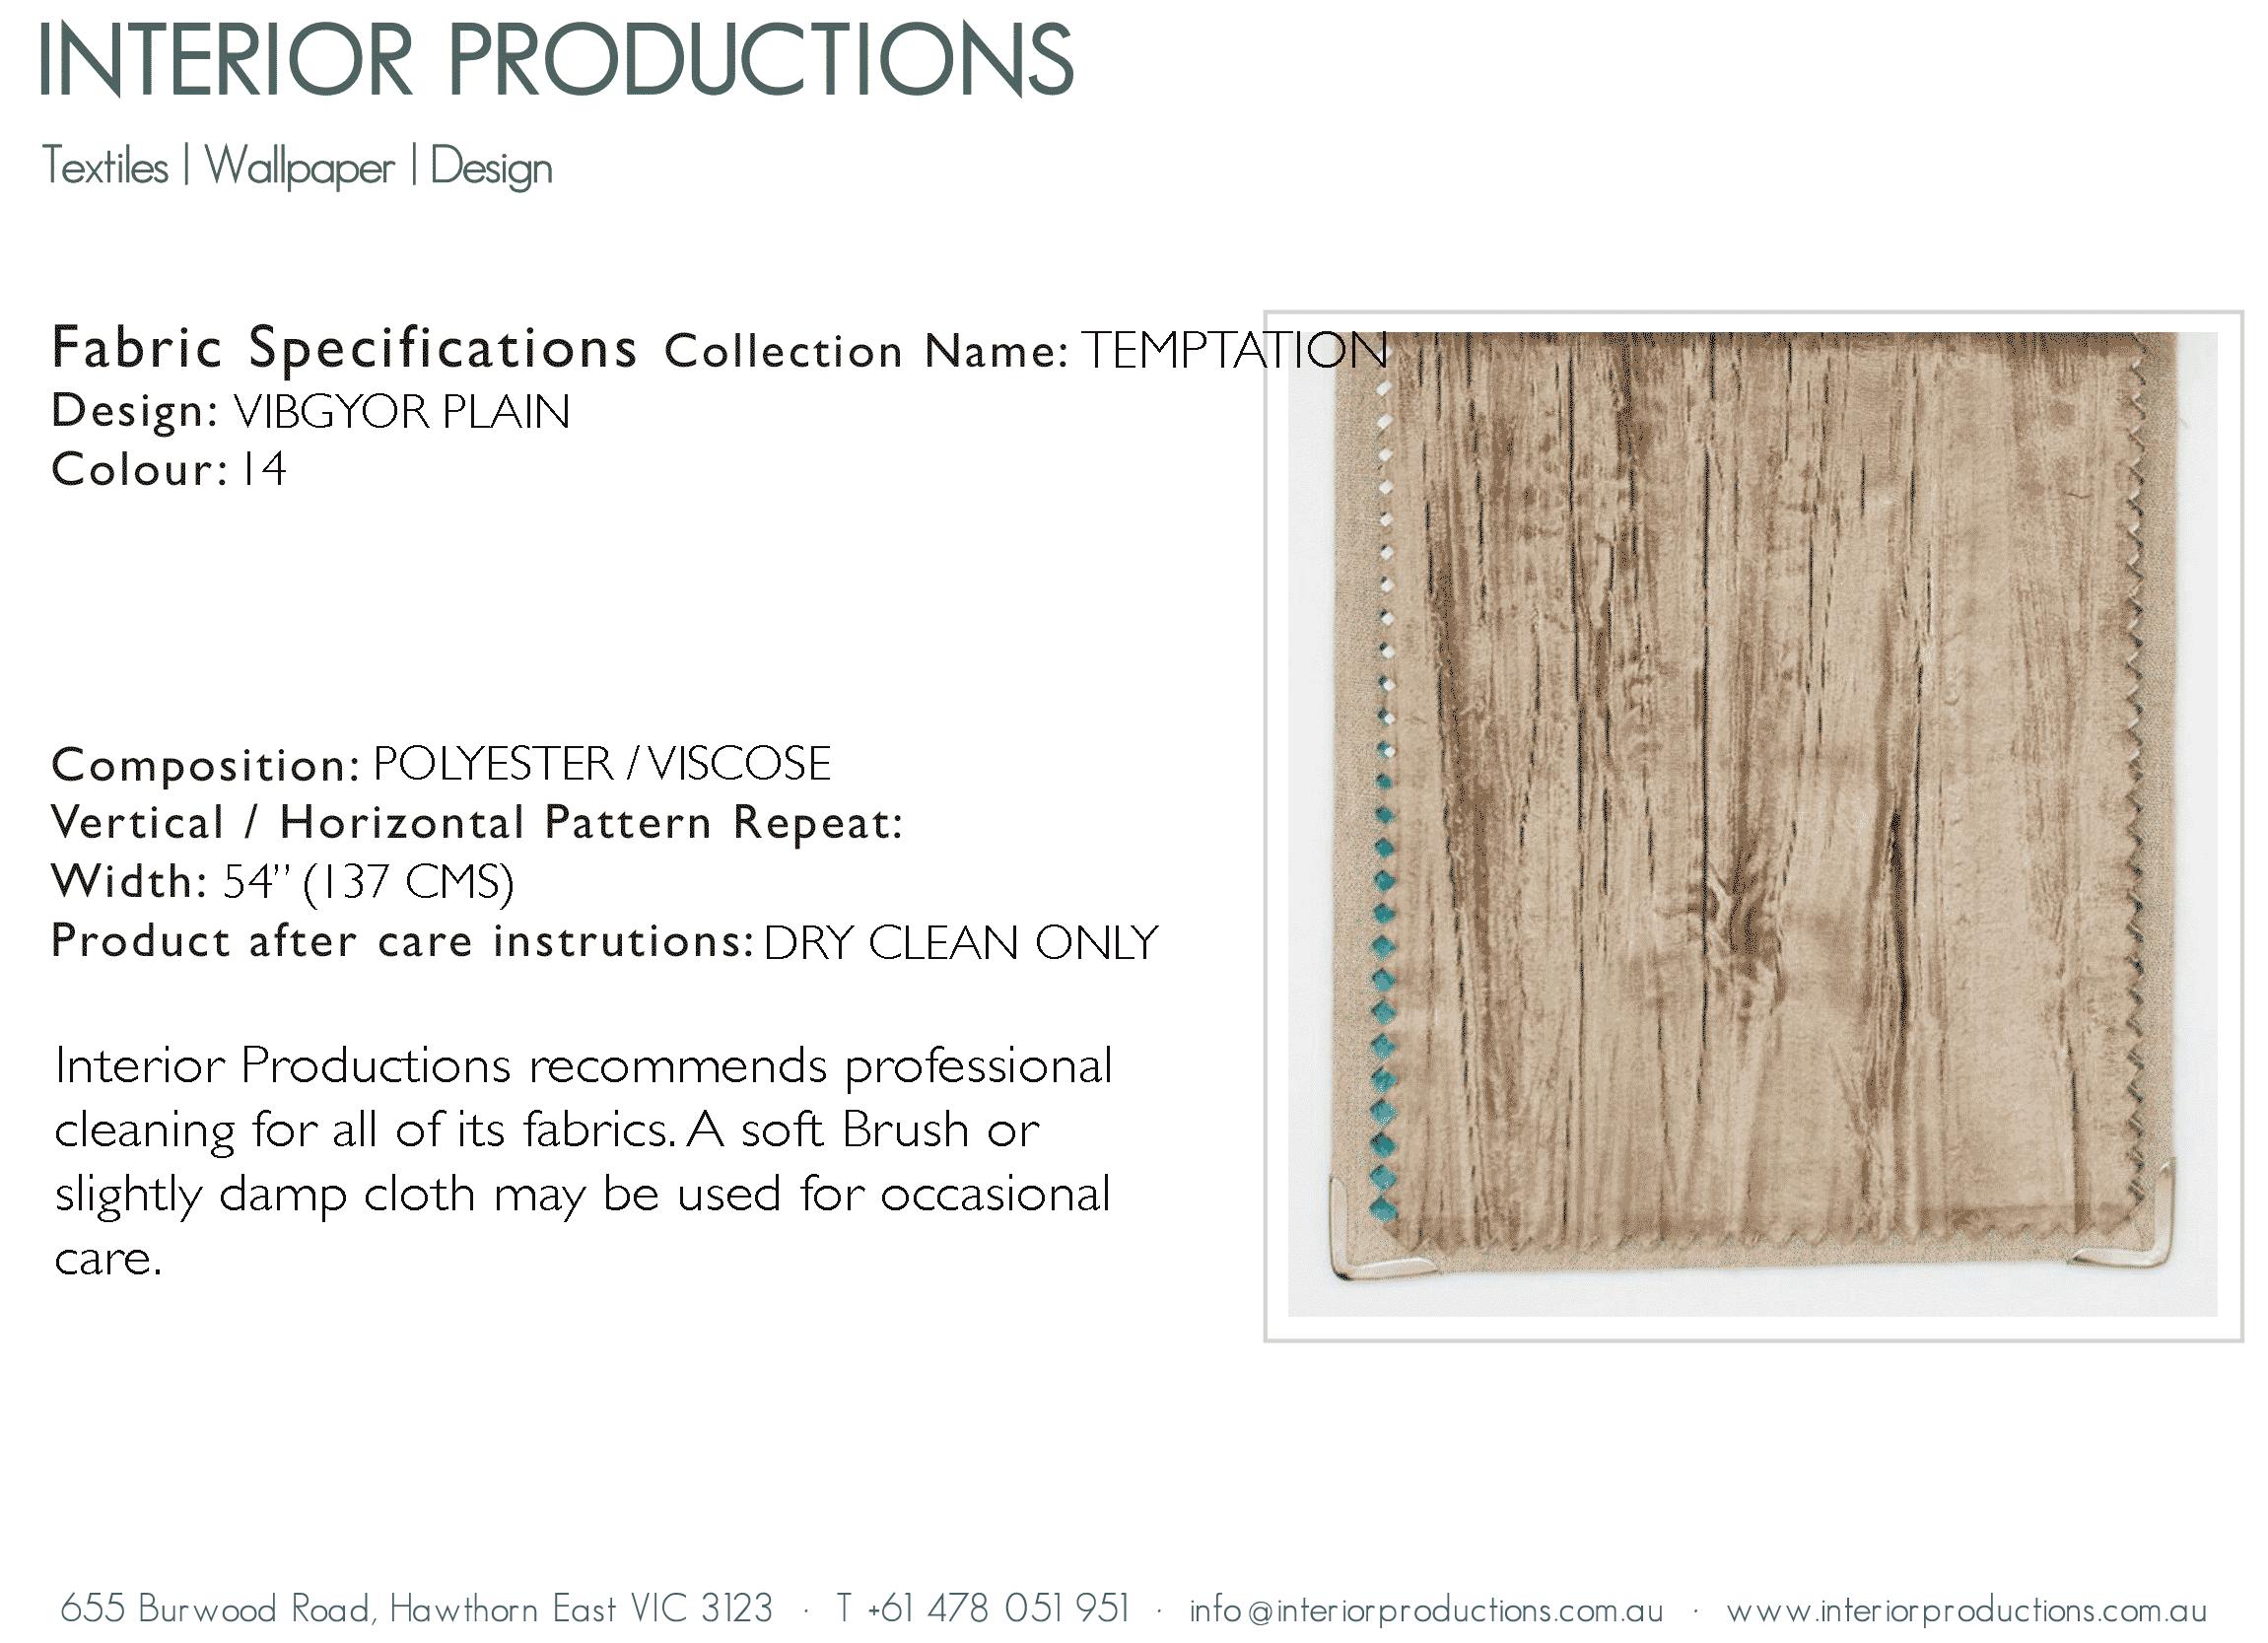 interior_productions_IBGYOR-PLAIN---14